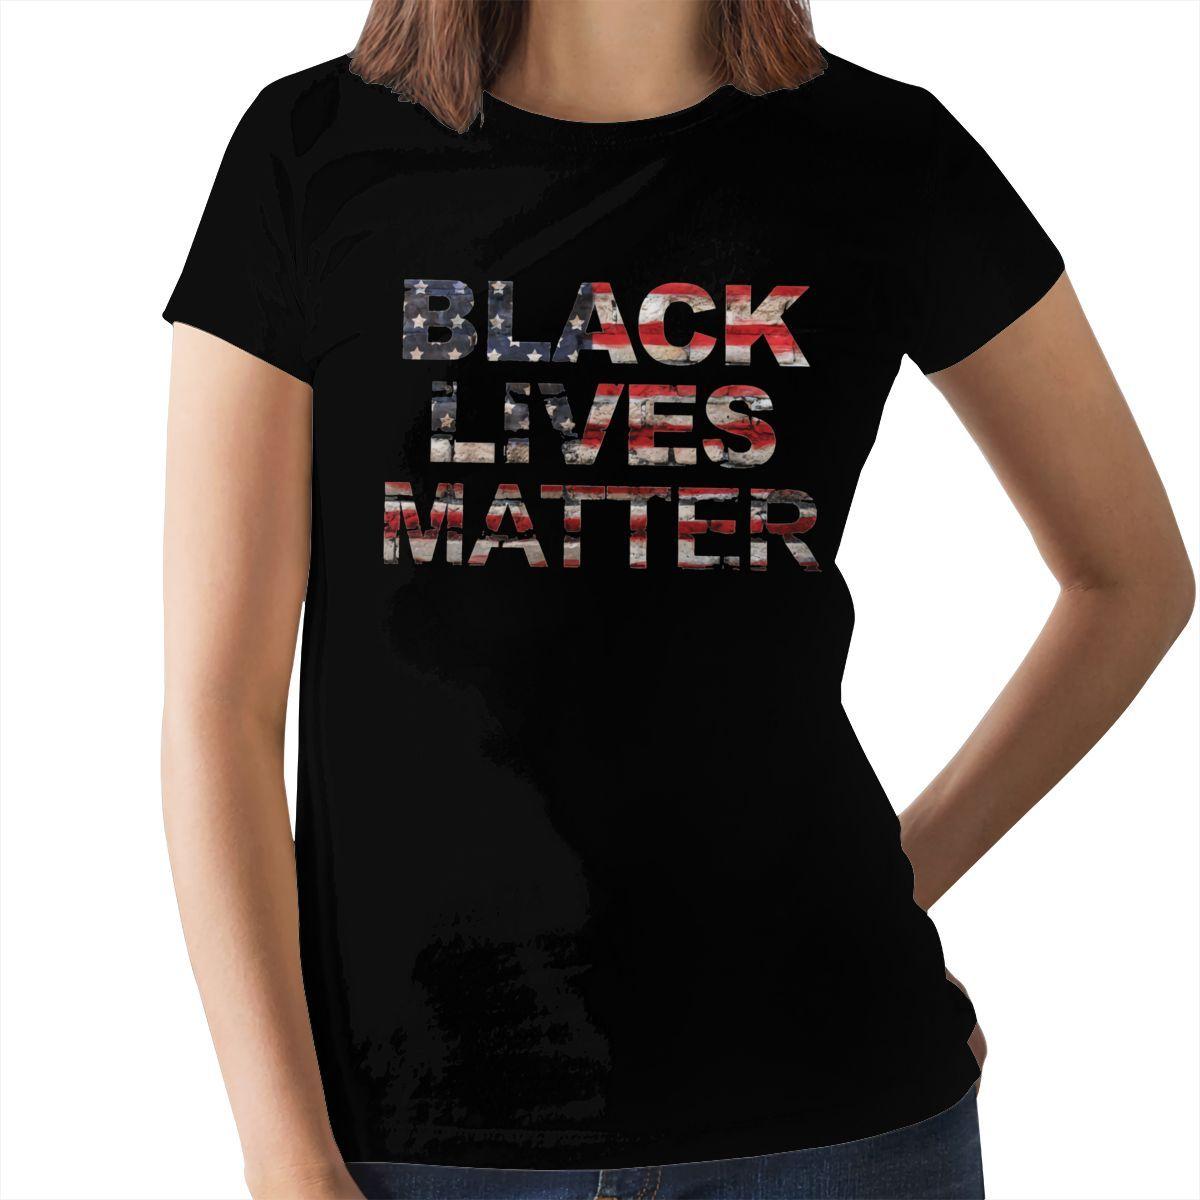 I Can't Breathe T-Shirt RIP George Floyd Say His Name T Shirt XXL Print Women tshirt O Neck Ladies Tee Shirt